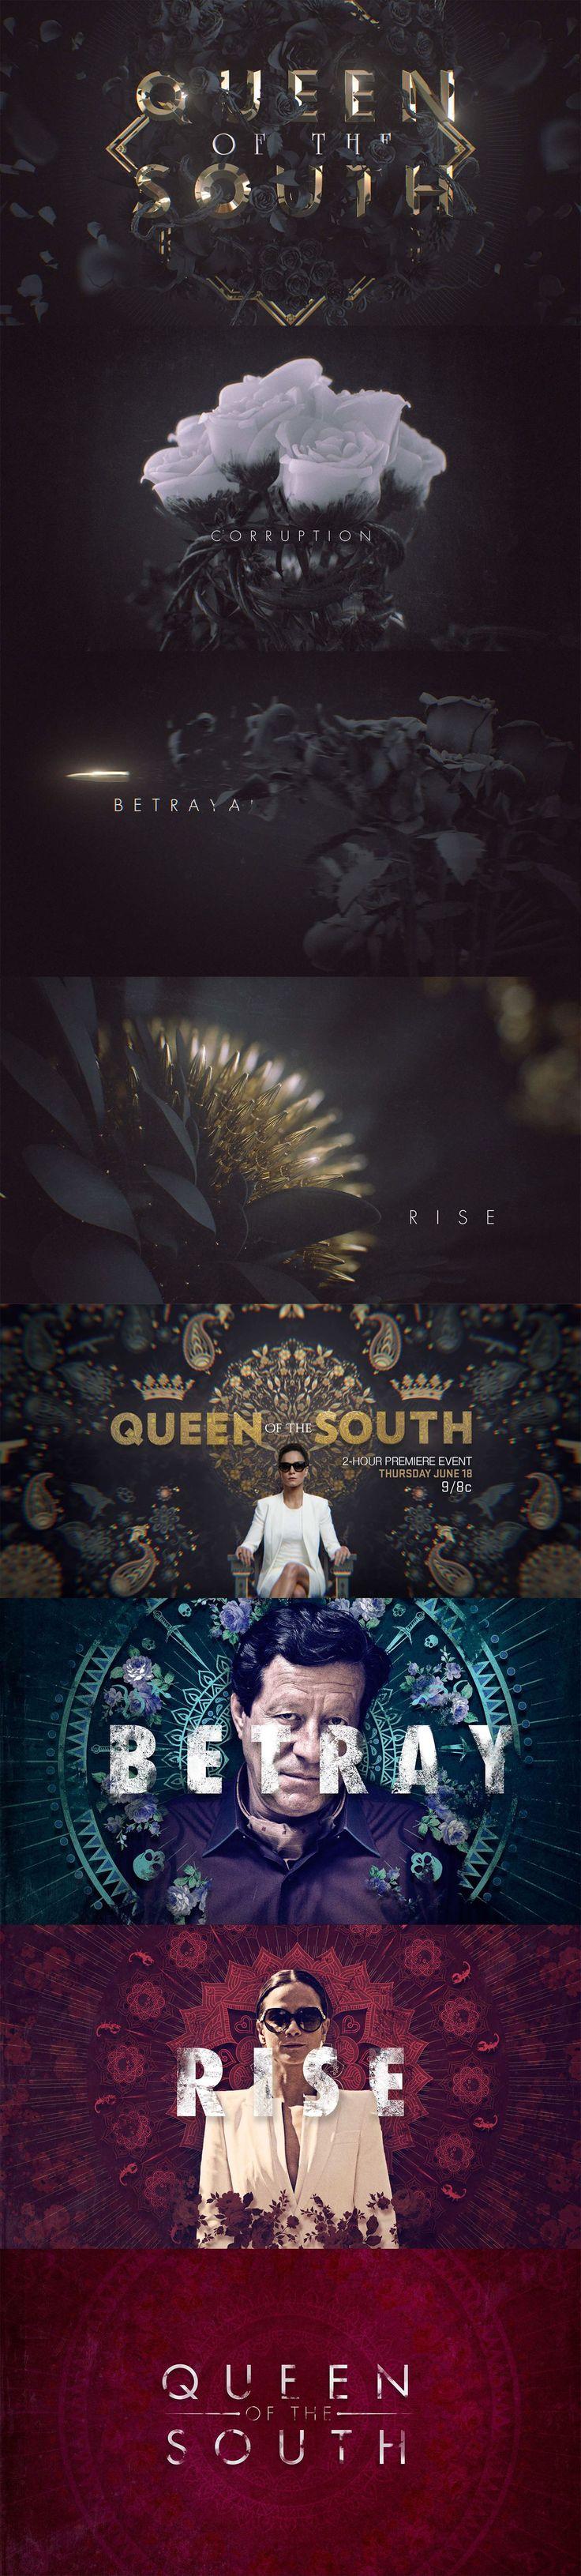 https://www.behance.net/gallery/53376843/Queen-Of-The-South-AE